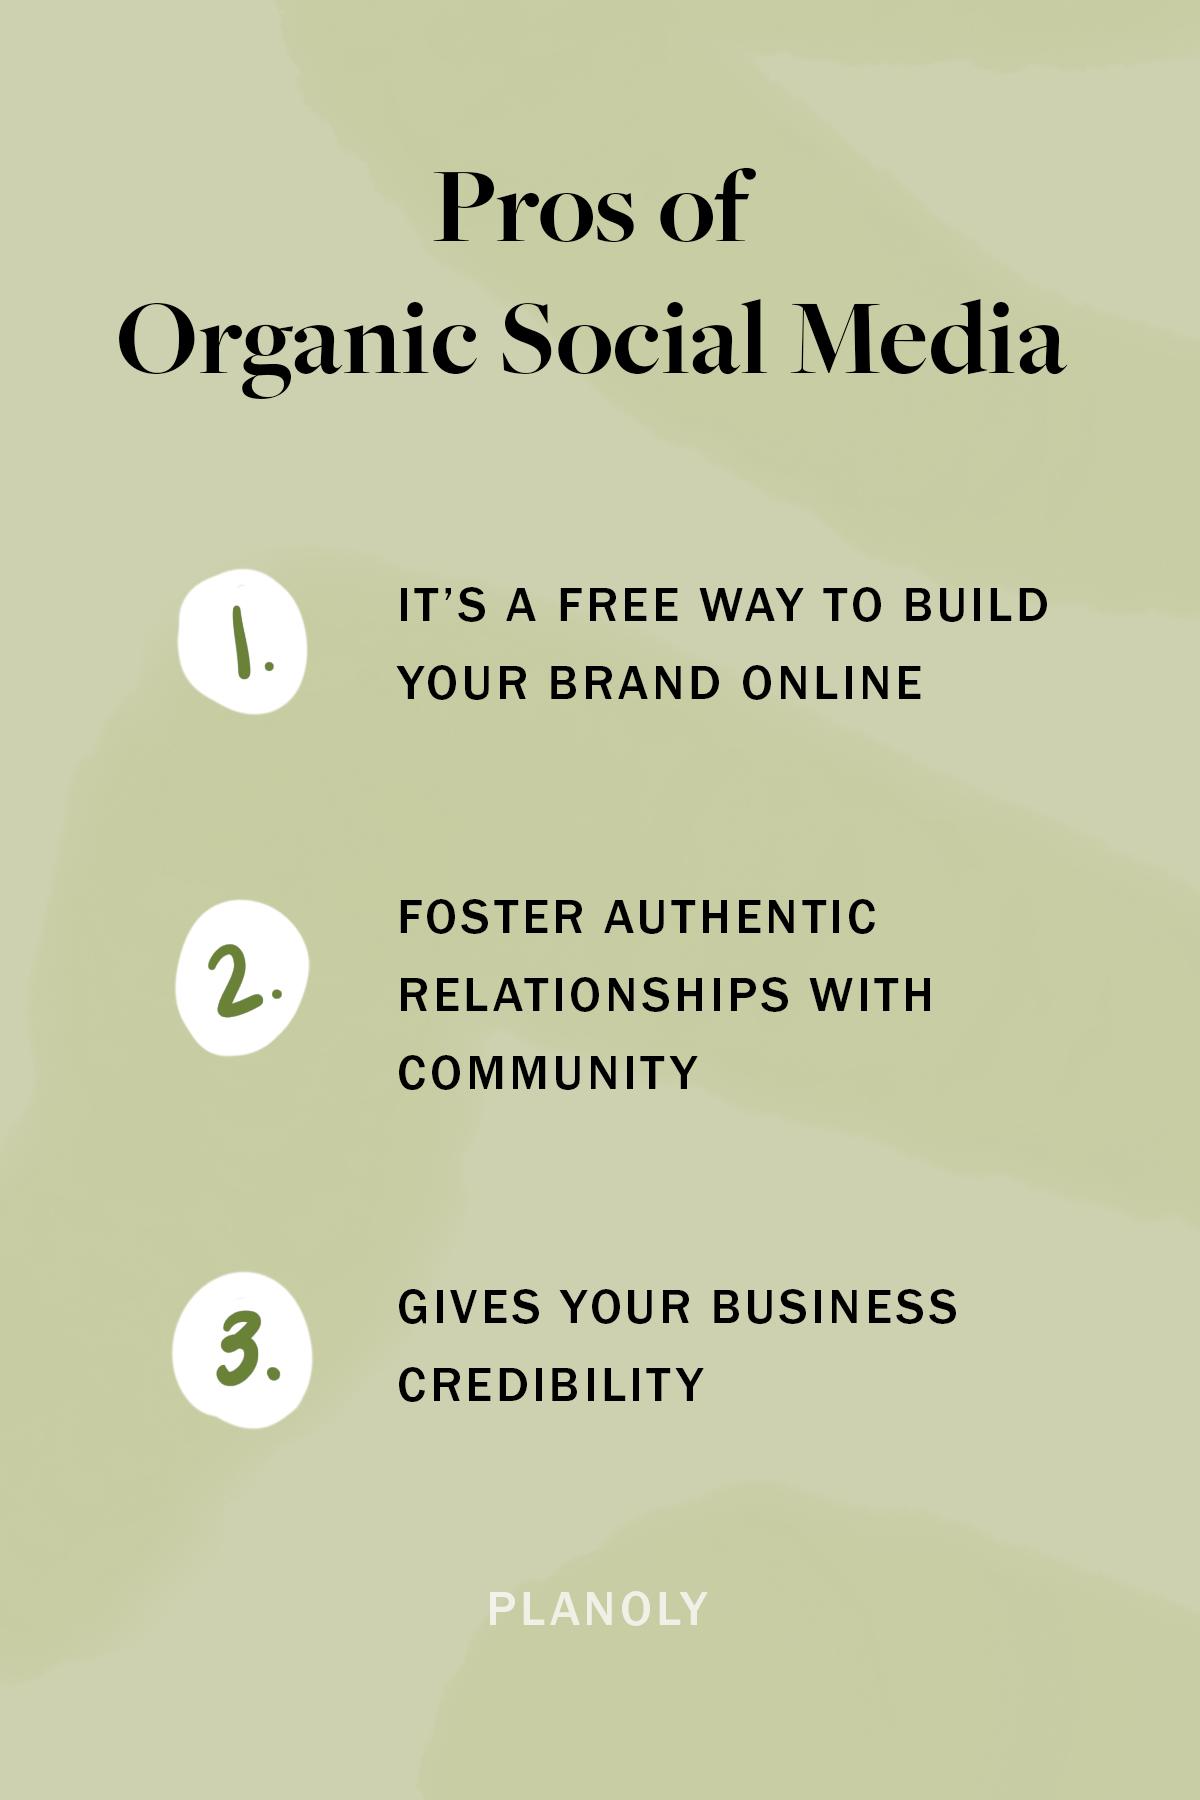 PLANOLY-Blog Post-Organic vs Paid Social-Image 2